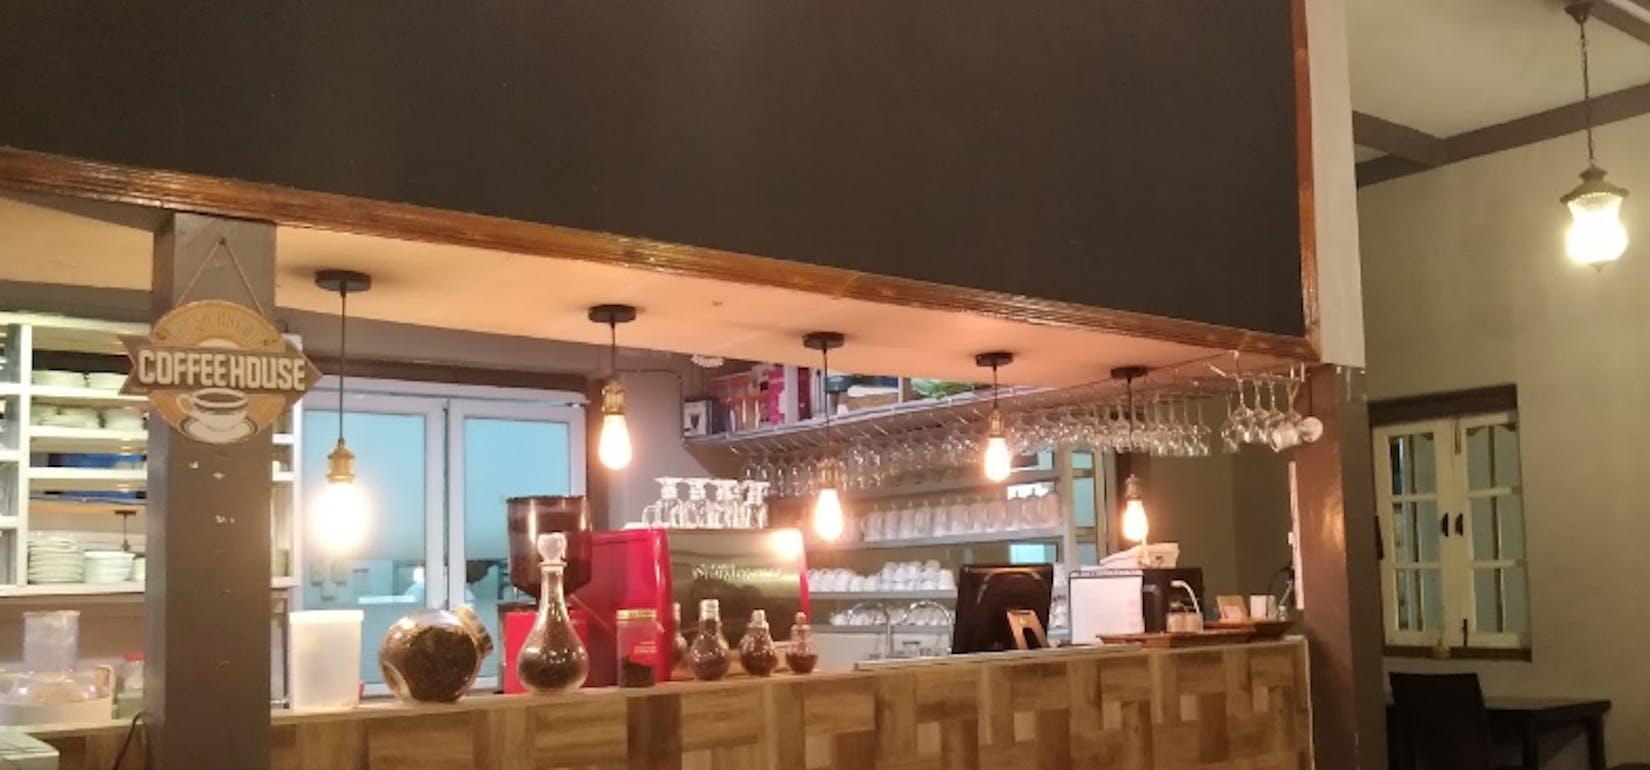 Calorie Cafe & Bakery | yathar